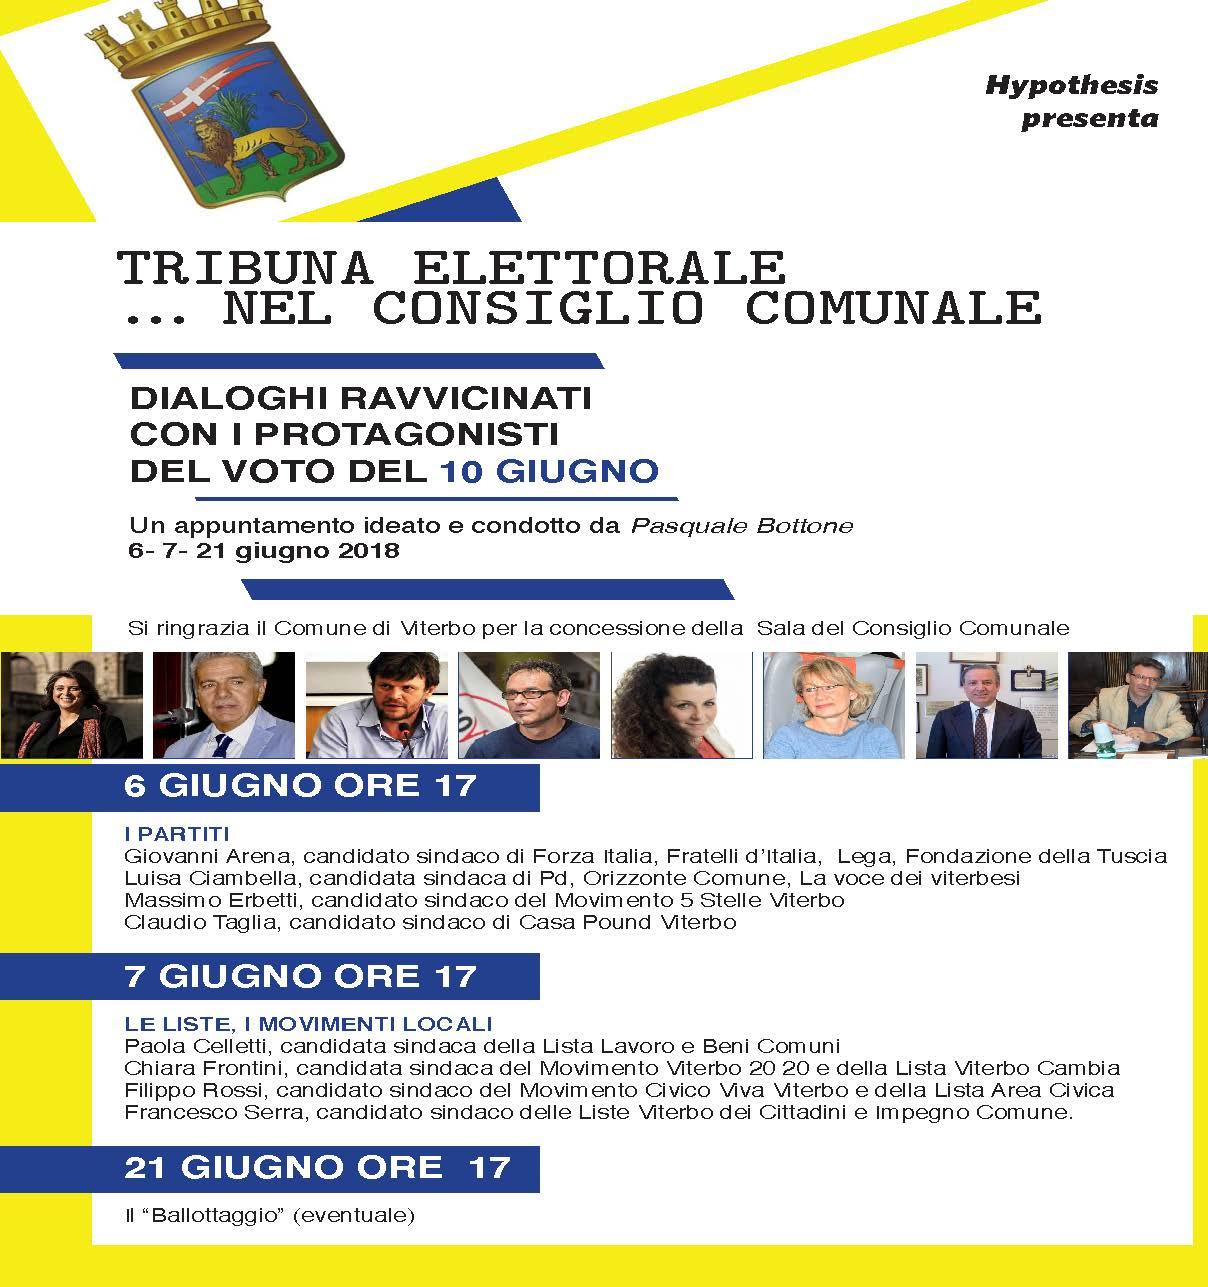 Tribuna Elettorale nel Consiglio Comunale: Pasquale Bottone intervista i candidati sindaci nella Sala del Consiglio Comunale il 6 e il 7 giugno (ore 17)